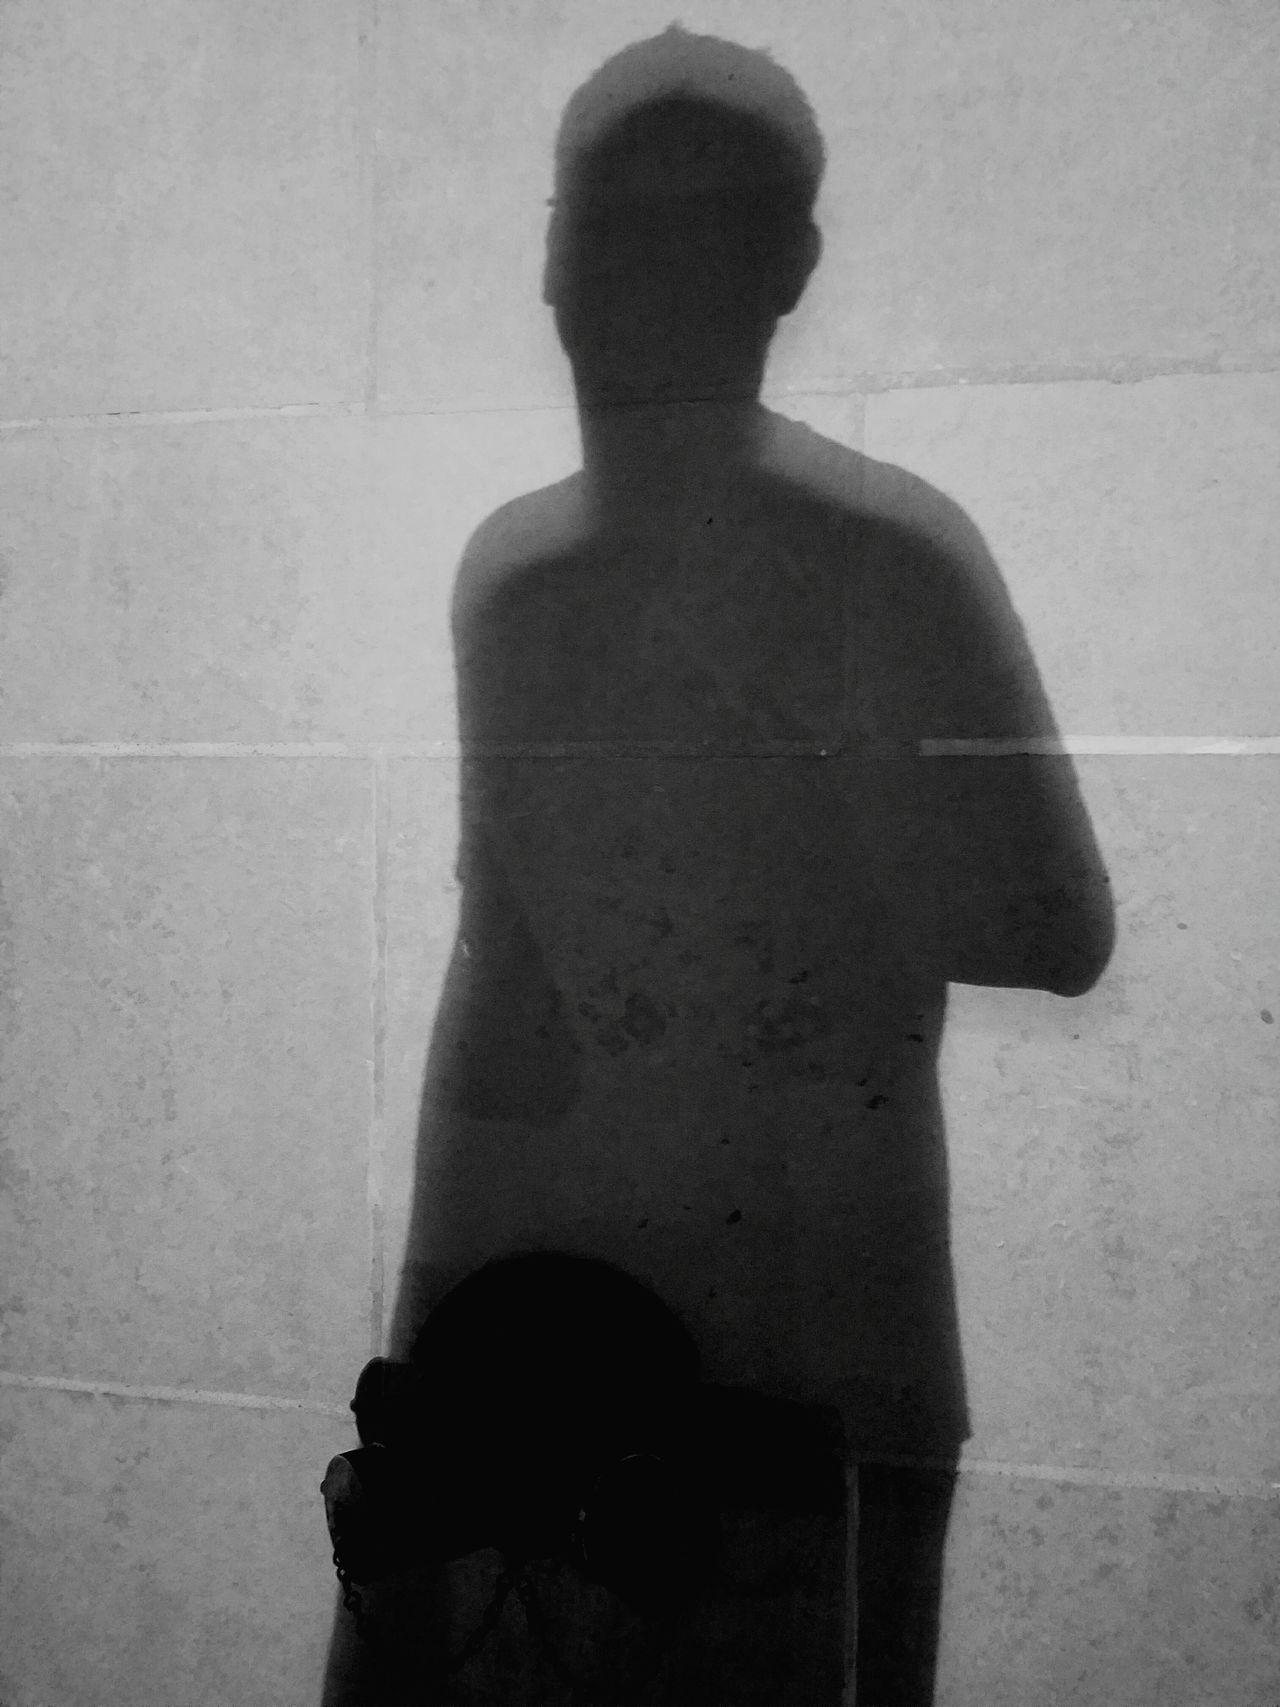 Silhouette That's Me Enjoying Life In The Dark Taking Photos Selfie Silhouette